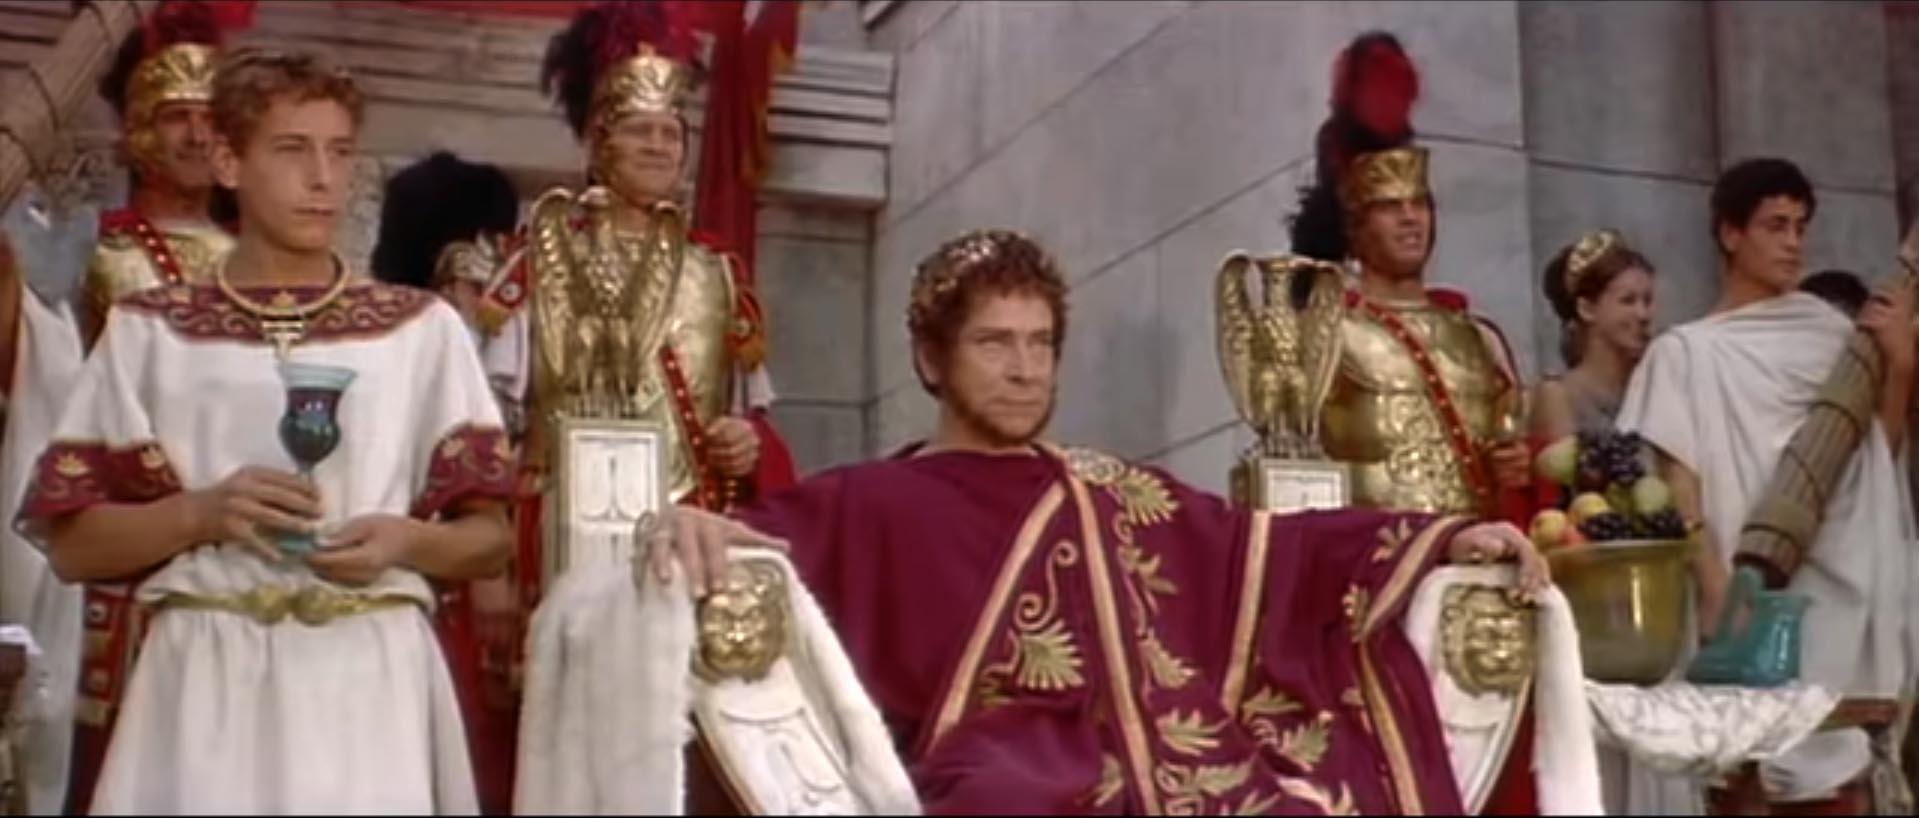 Ivan Triesault as Emperor, Barabbas (1961)